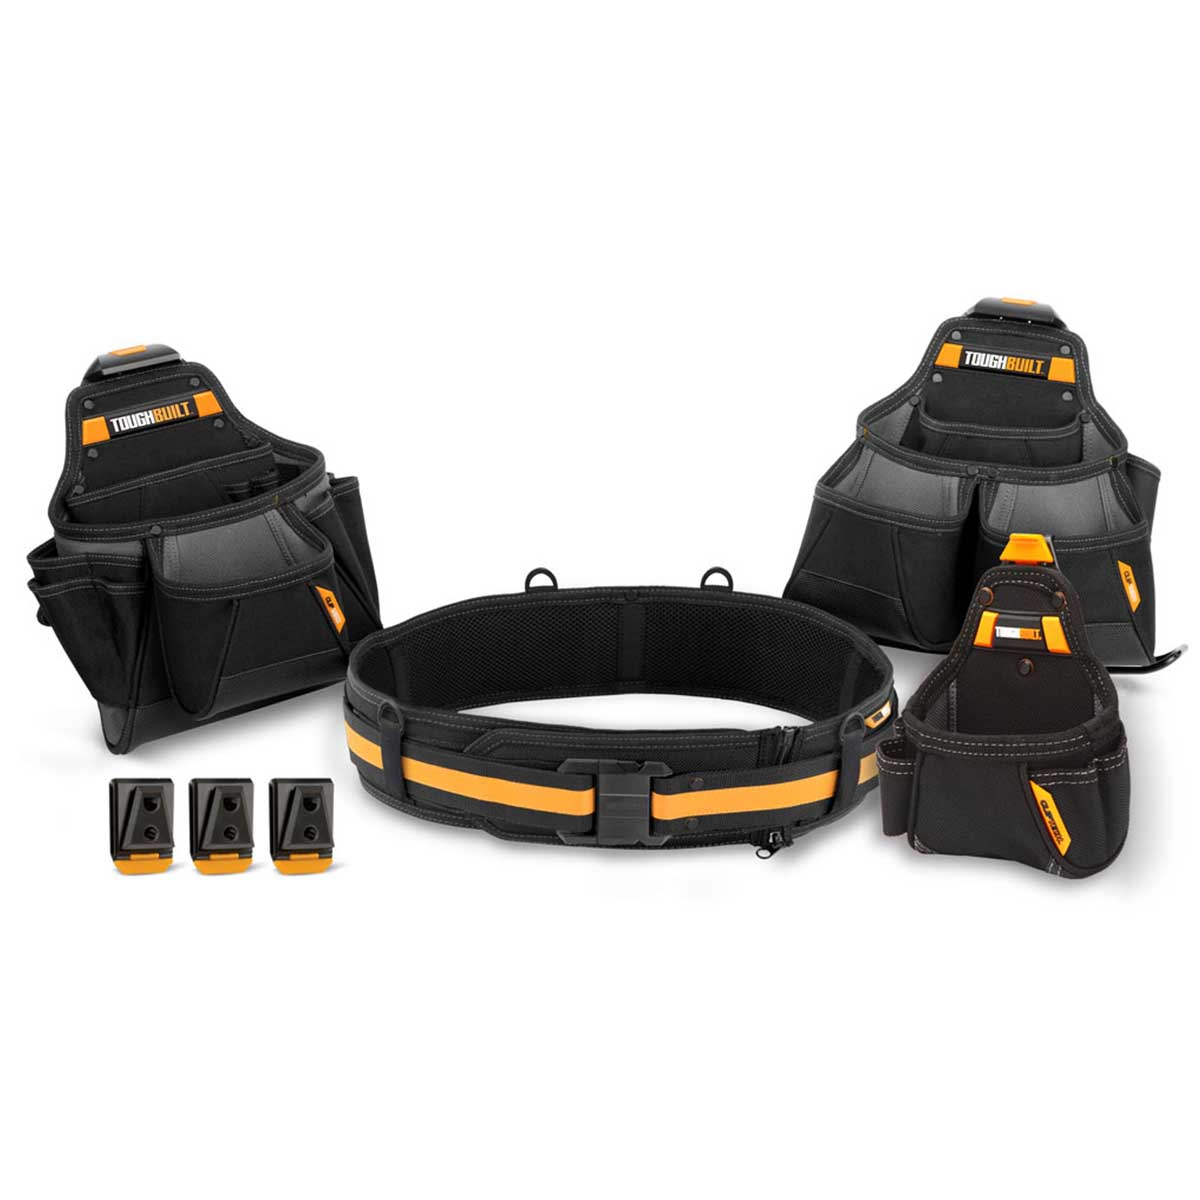 Bolsas Porta Herramientas 36 Bolsillos + Cinturon Toughbuilt